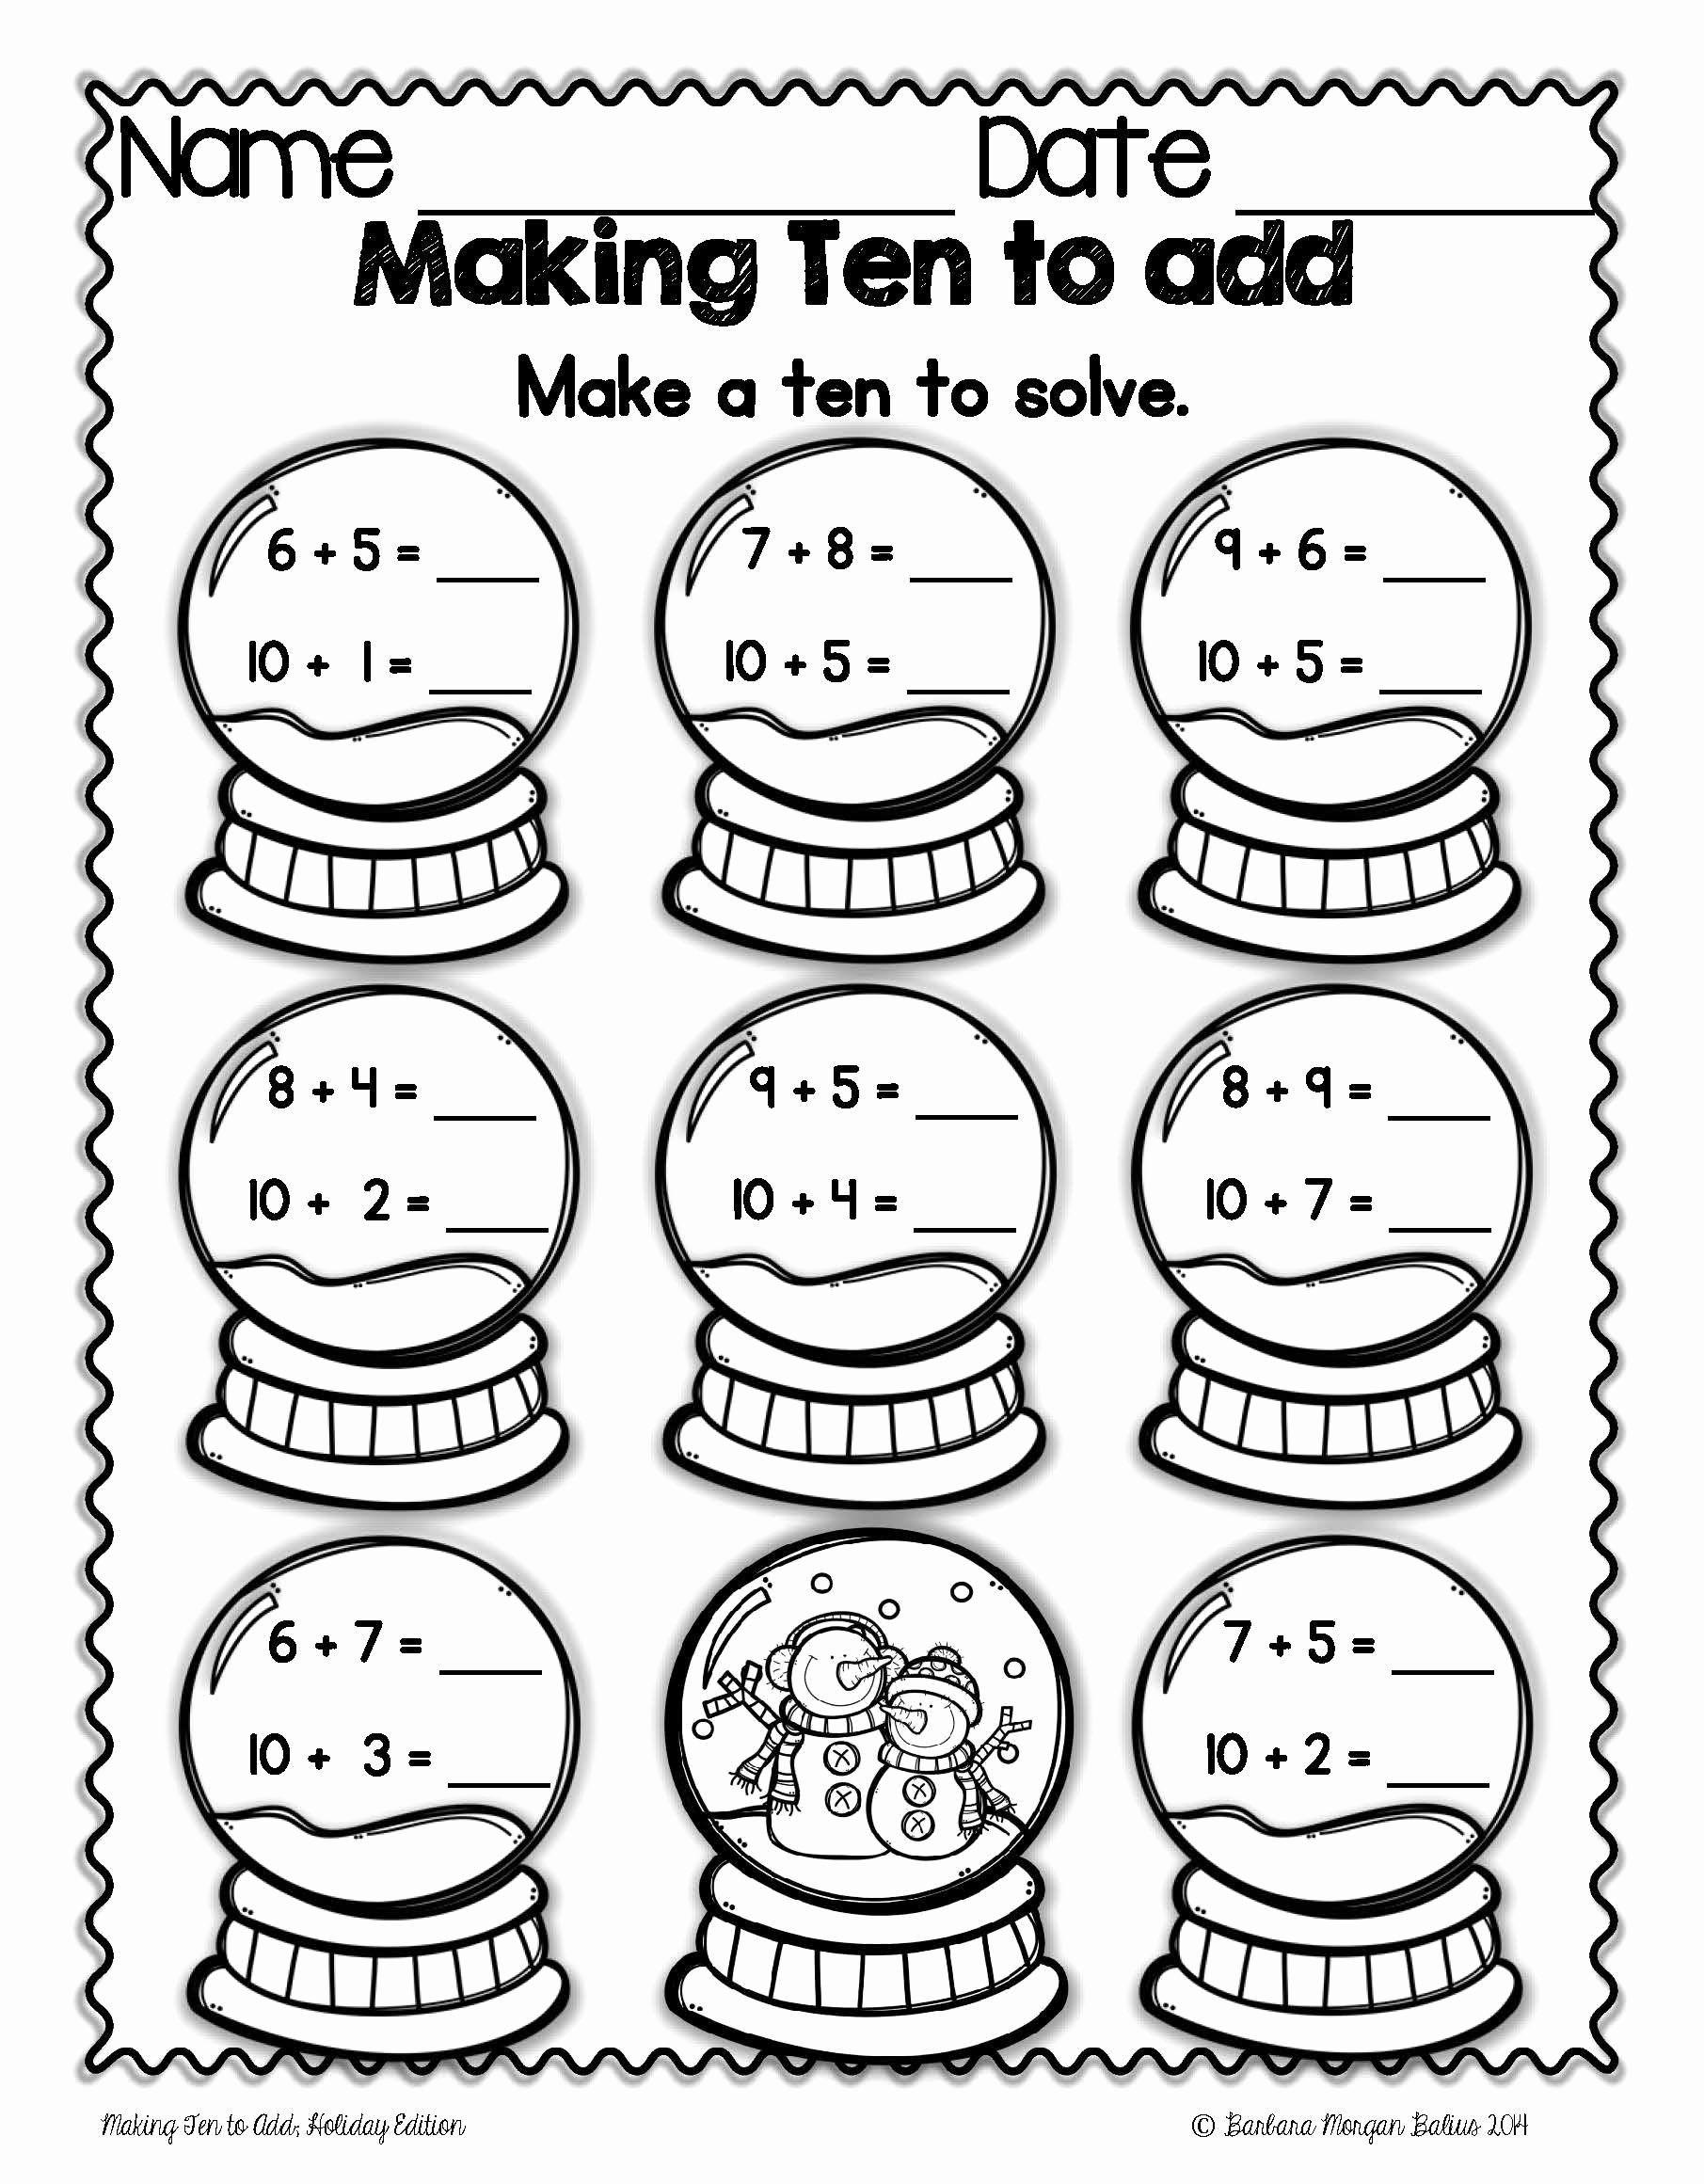 Christmas Number Worksheets For Preschoolers Fresh Worksheets Worksheets Puzzle Kindergarten Math Worksheets Holiday Math Worksheets Halloween Math Worksheets [ 2321 x 1811 Pixel ]